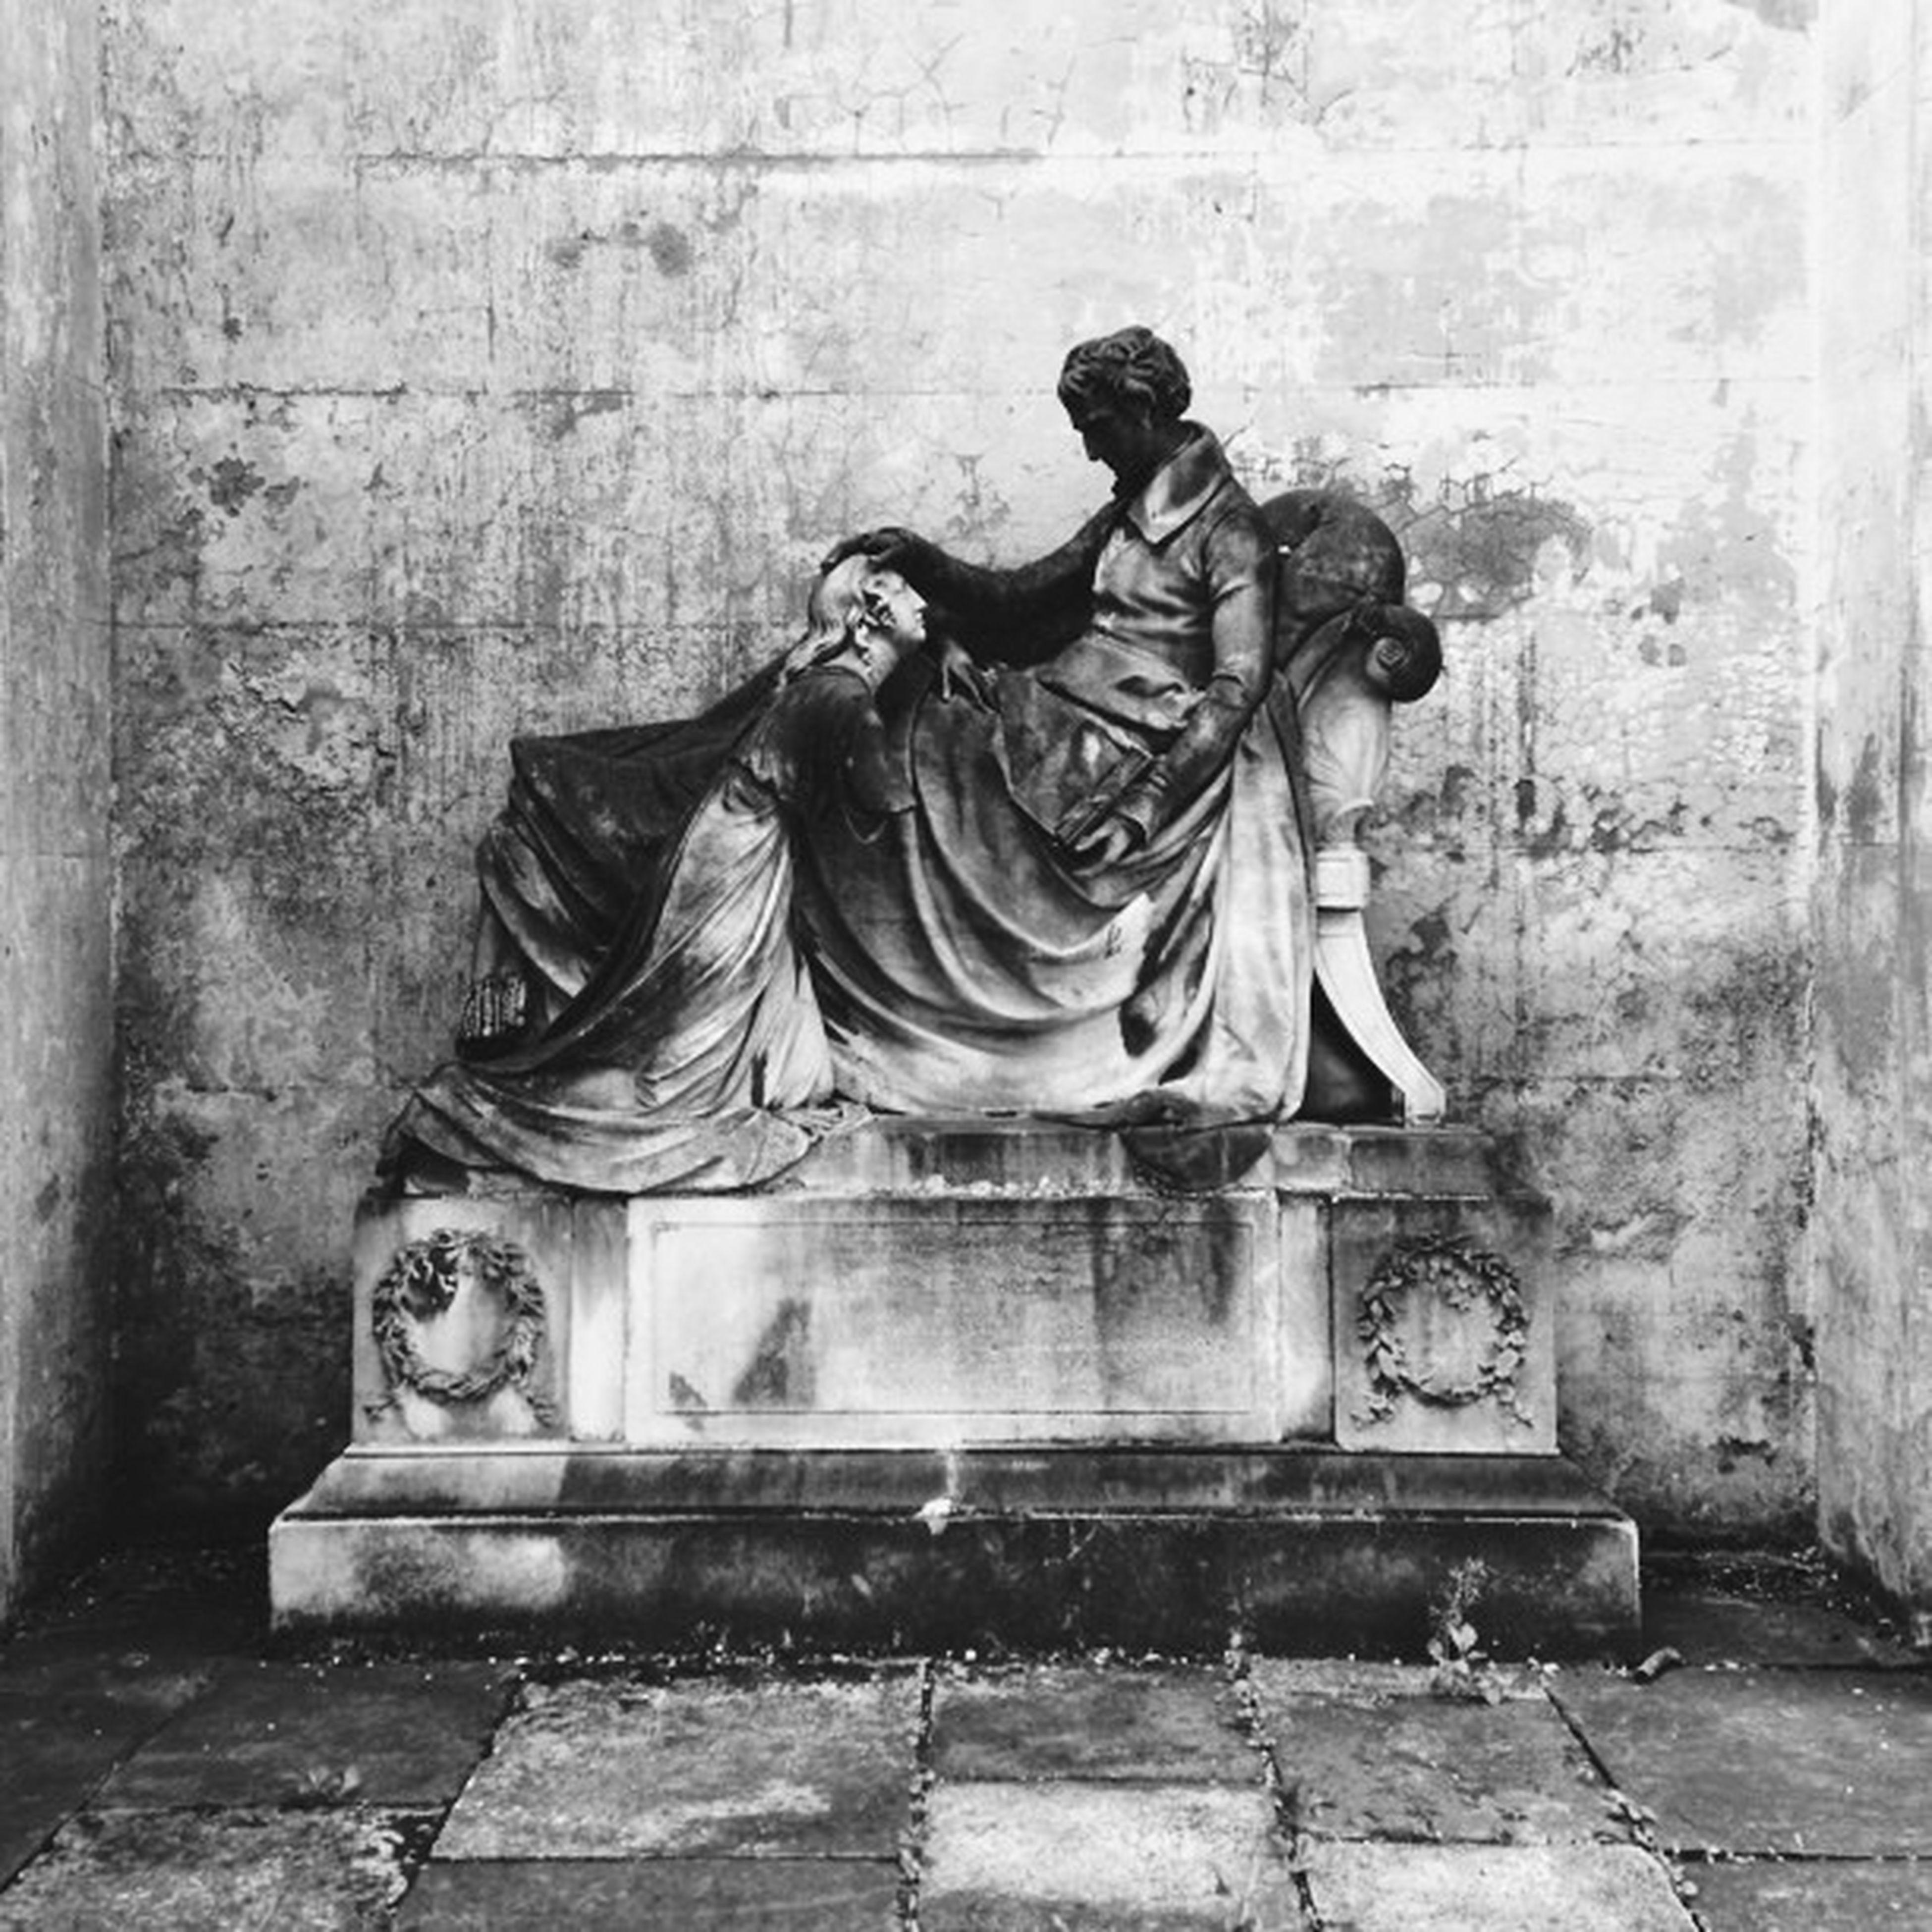 Vscocam Statue Kensalrise Westlondoncrematorium harrowroad london england uk bw blackandwhite monochrome stone tiles